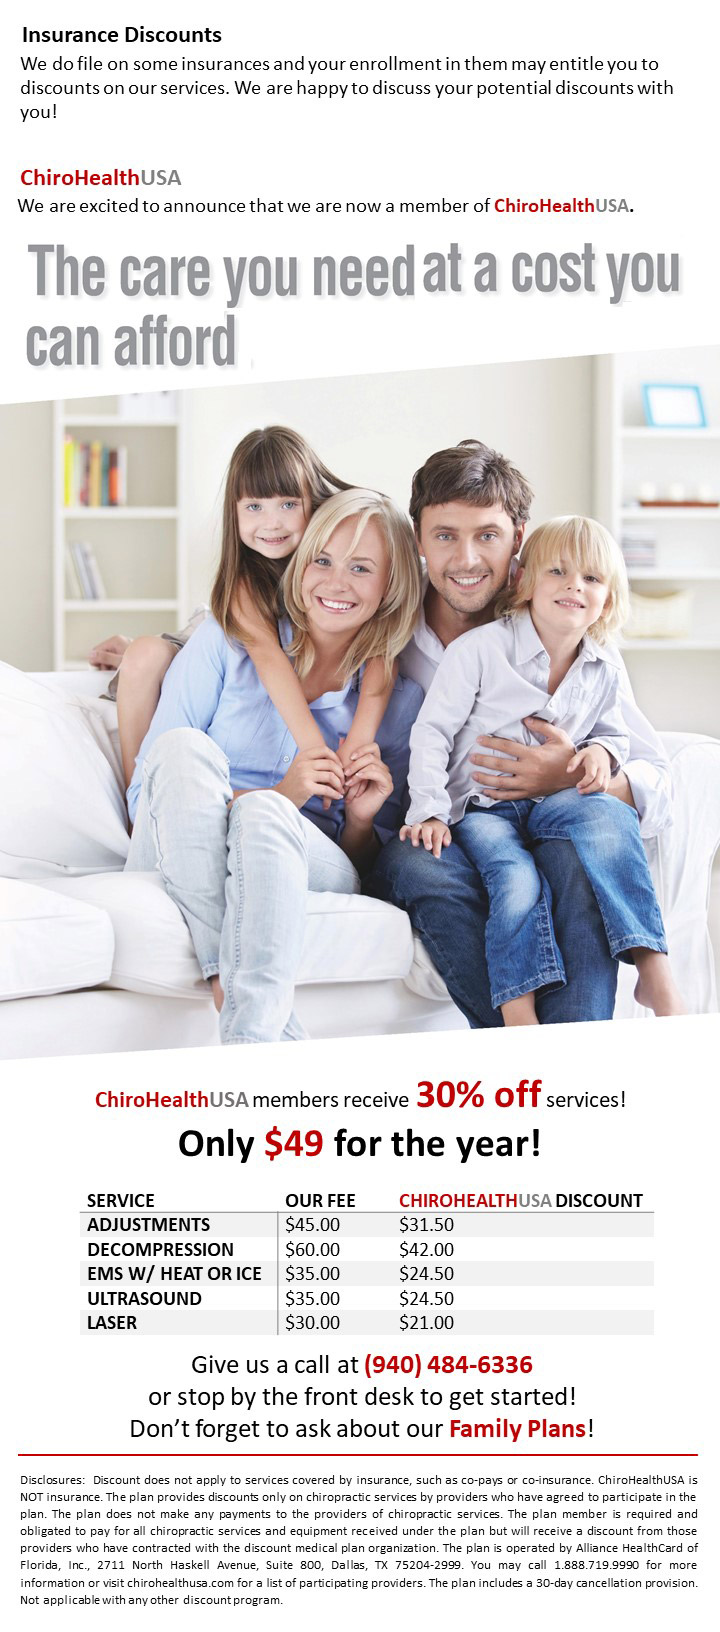 Insurance discount flyer